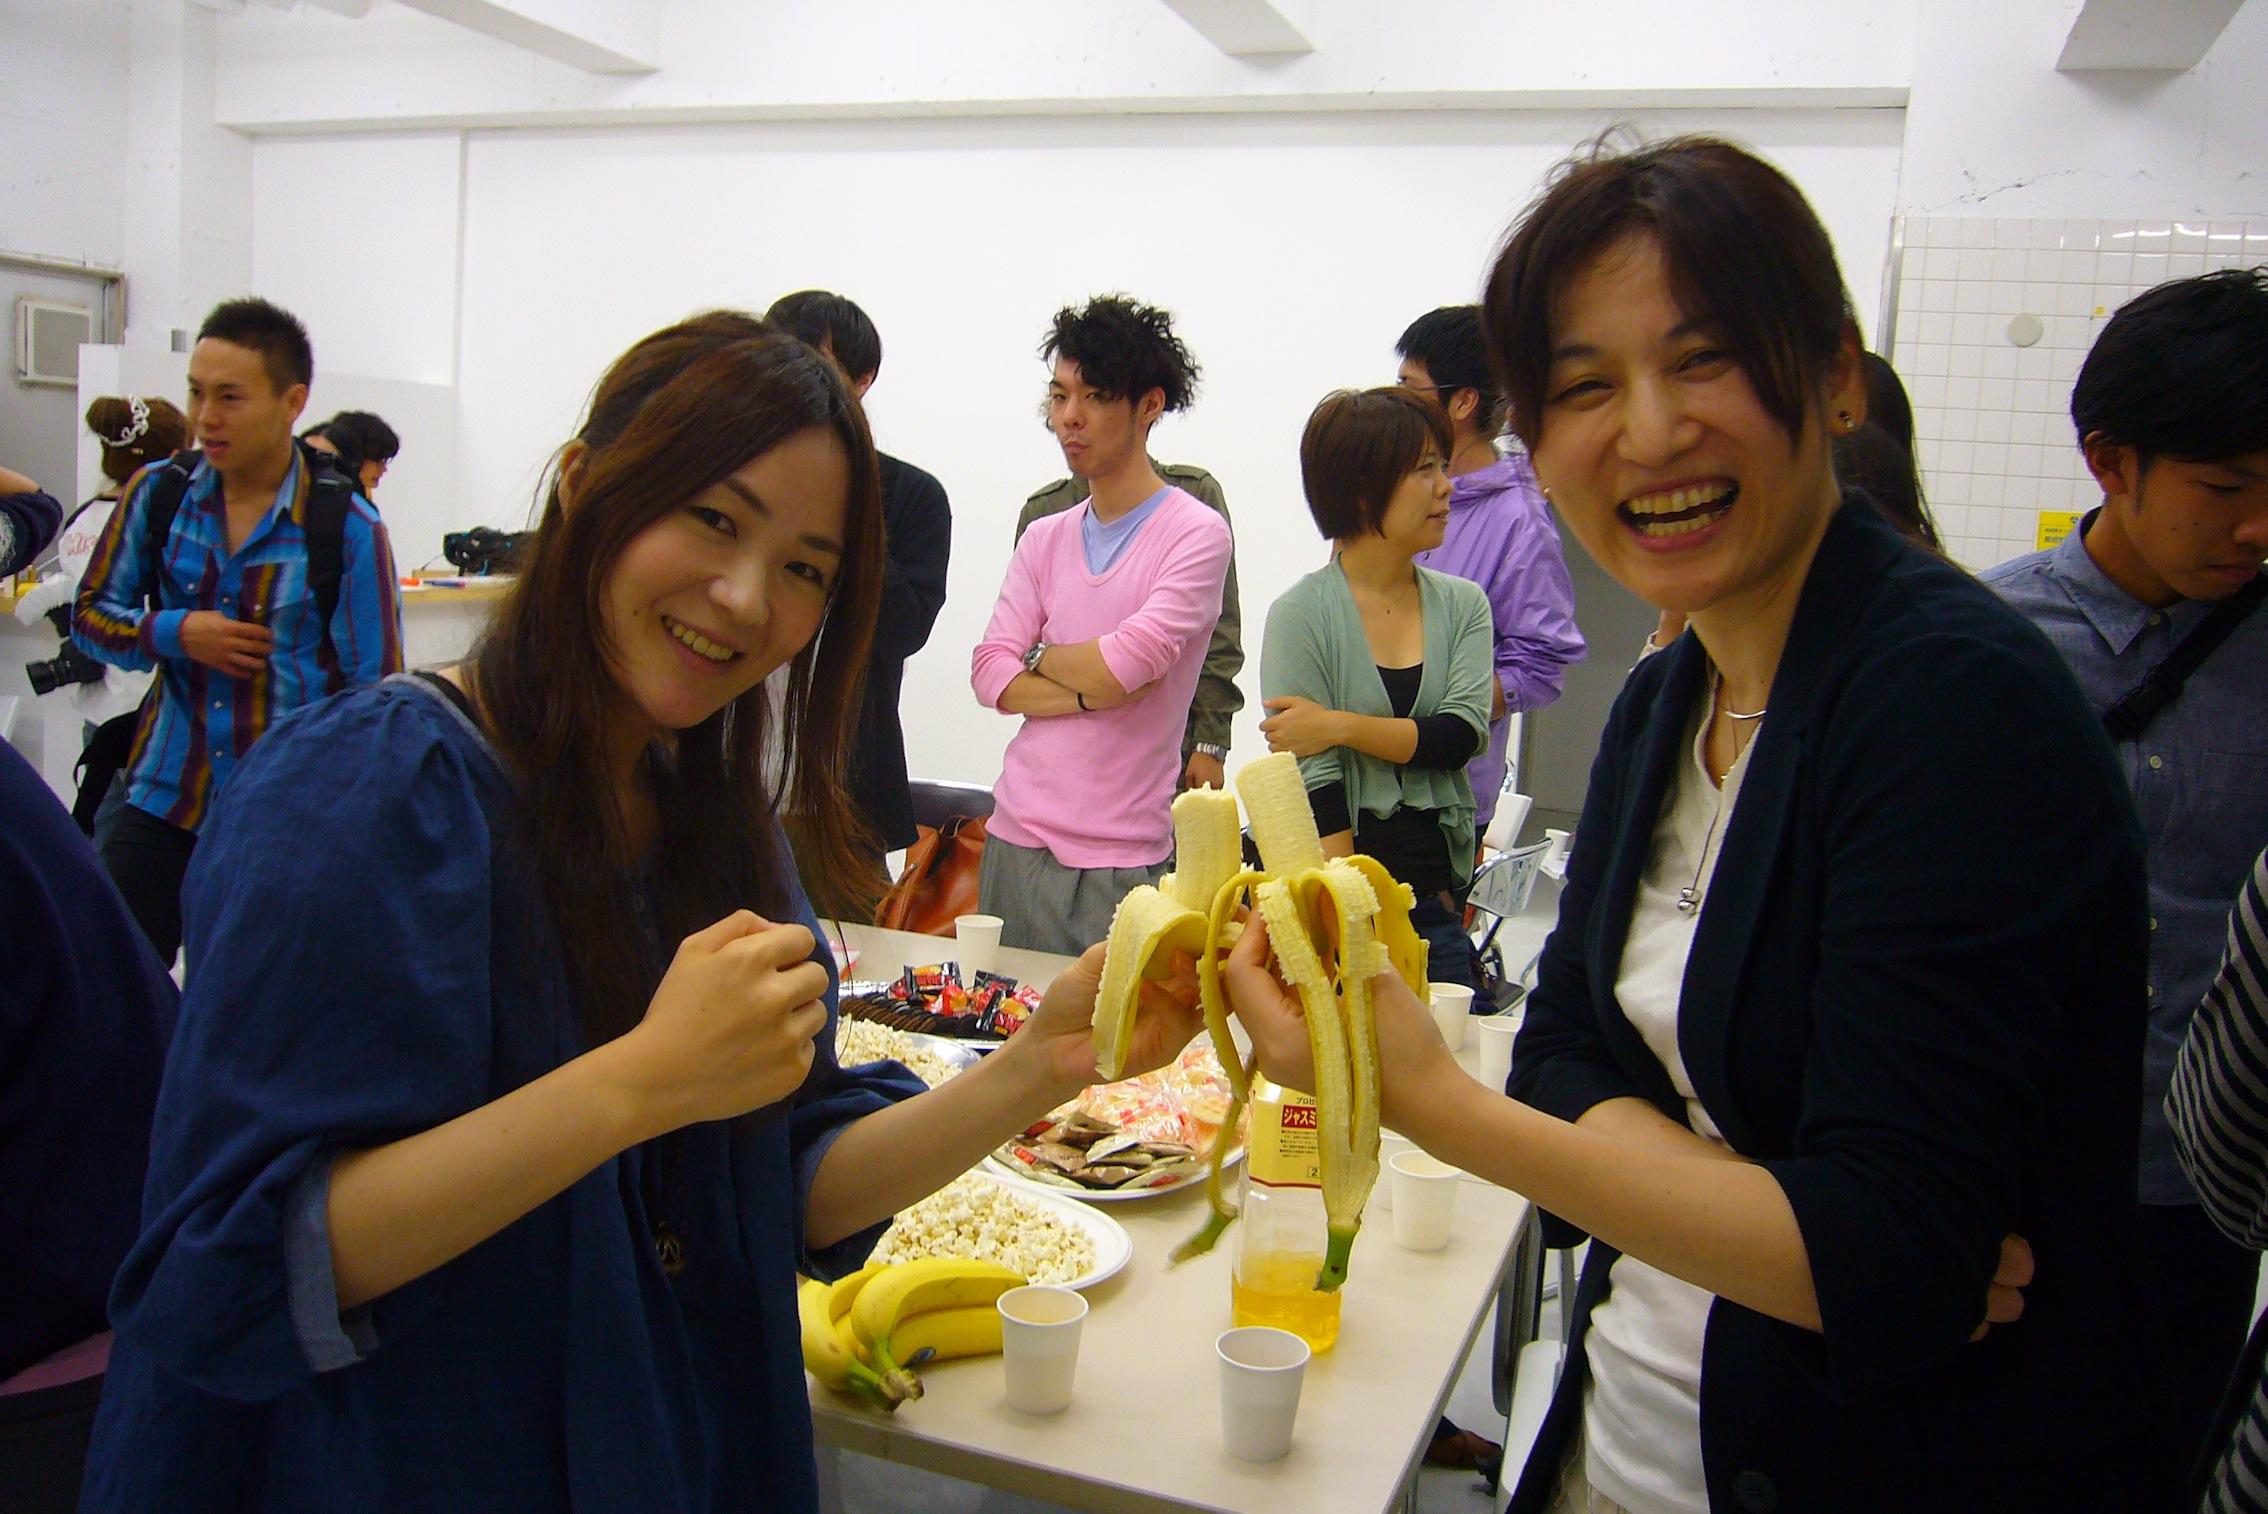 http://blog.3331.jp/staff/file/P1030425.JPG